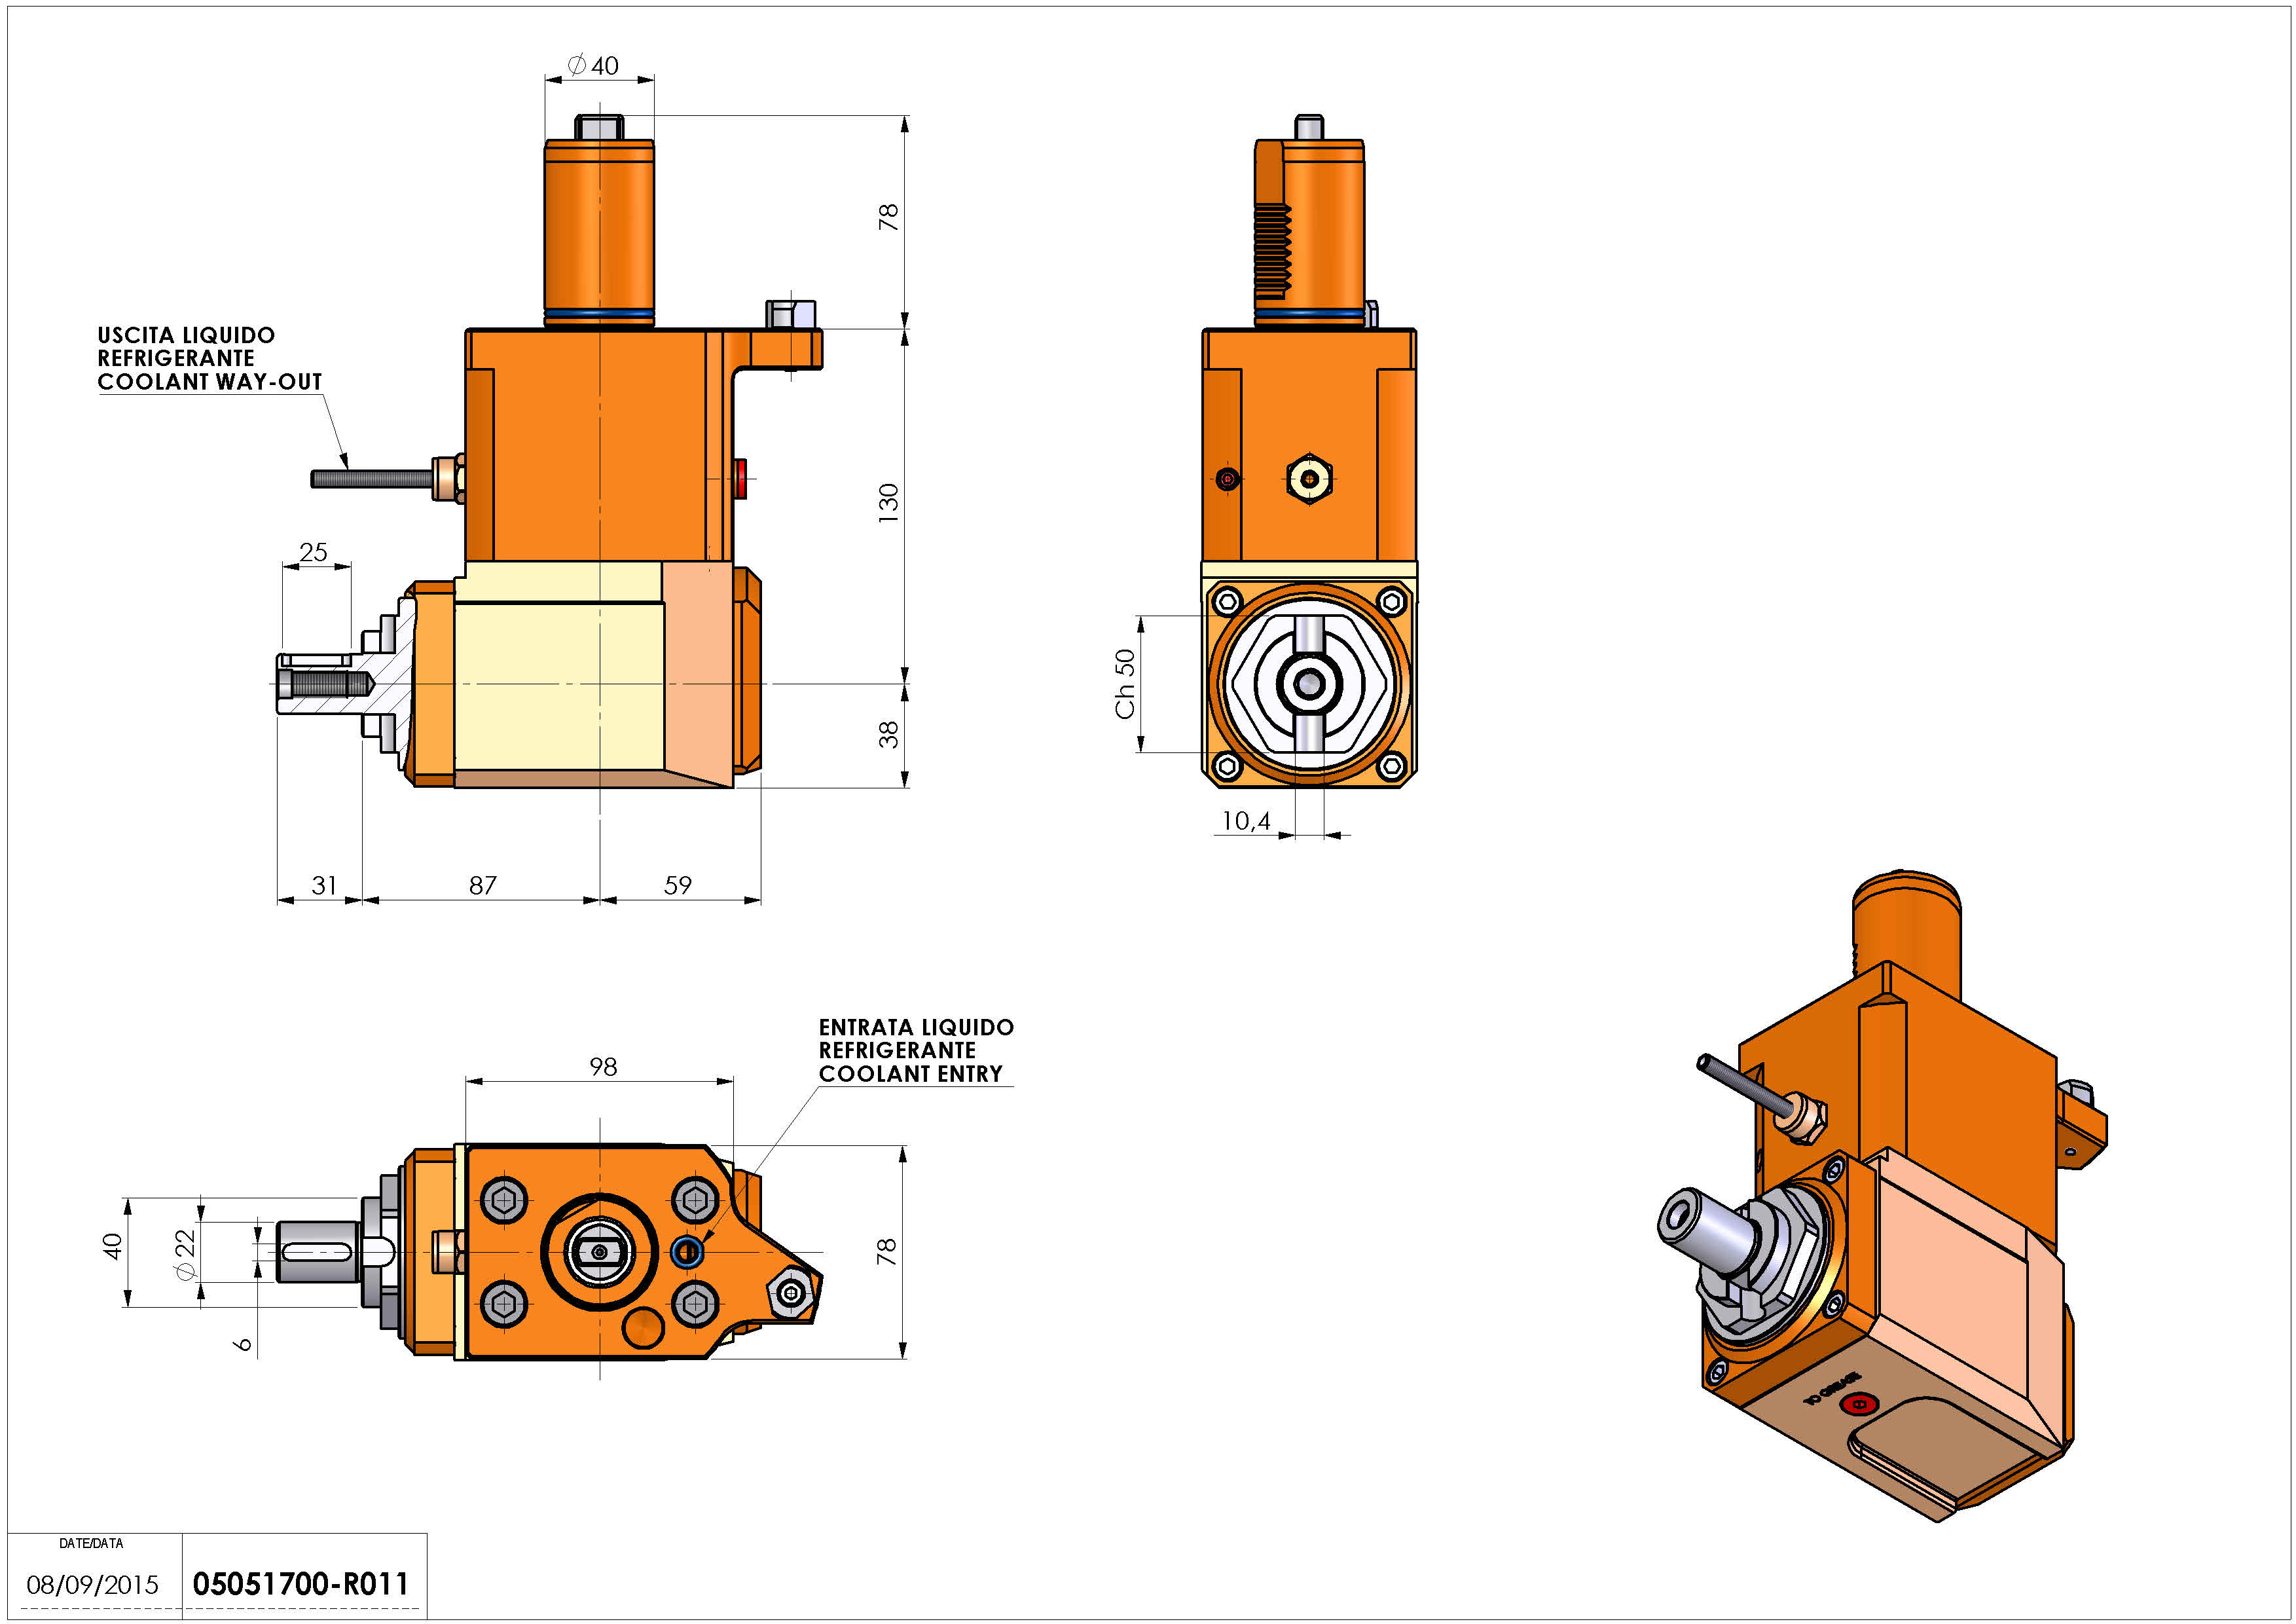 Technical image - LT-A VDI40 DIN138-22 L H130 MZ.